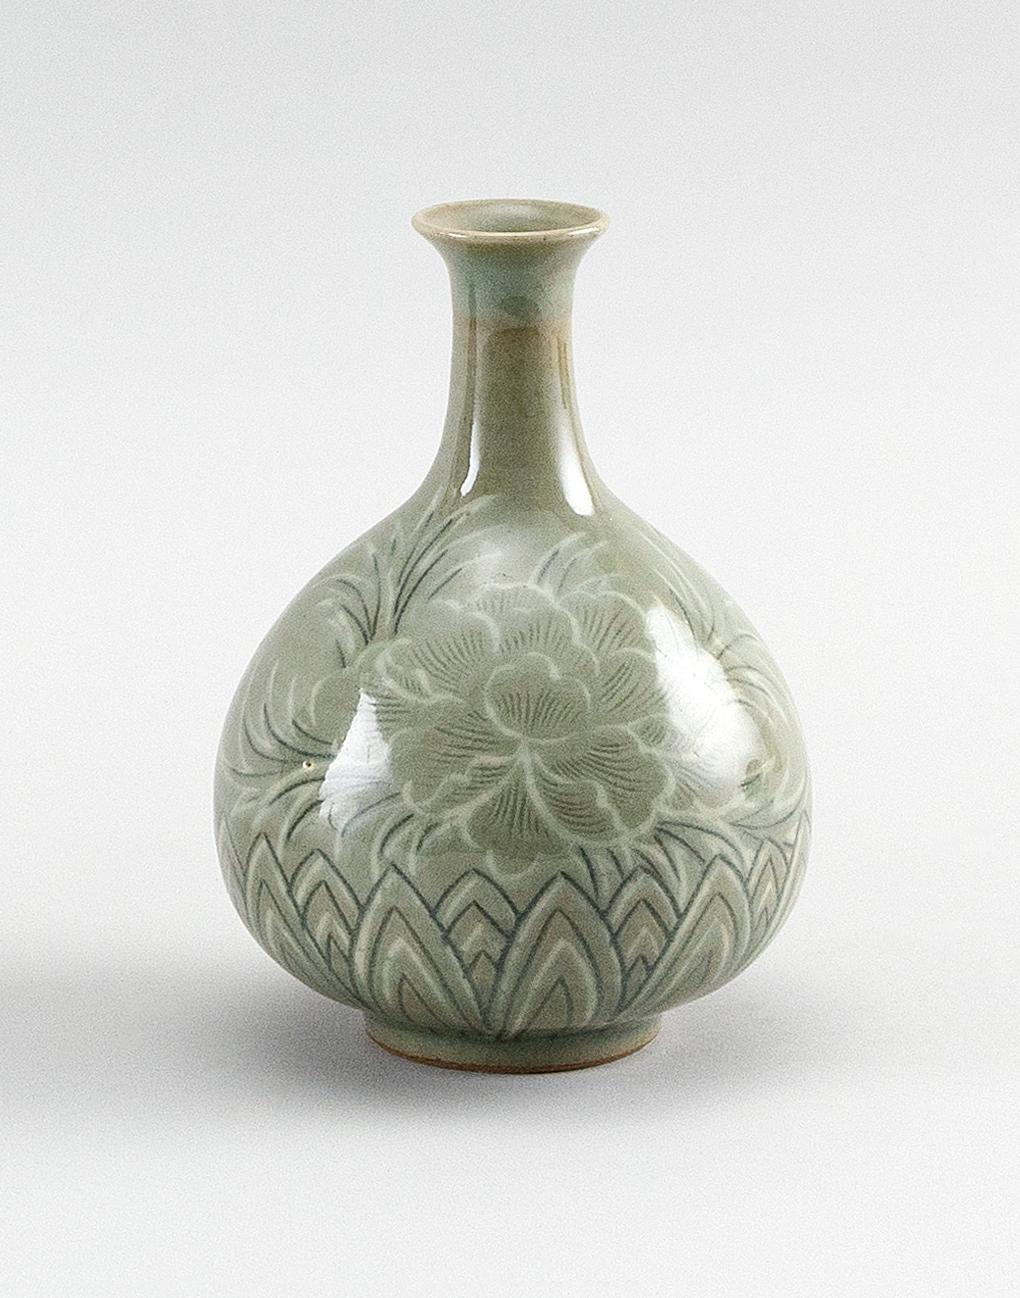 "KOREAN CELADON GLAZE BOTTLE VASE Floral and lappet decoration. Height 6.5"". Provenance: A private Florida Collection."